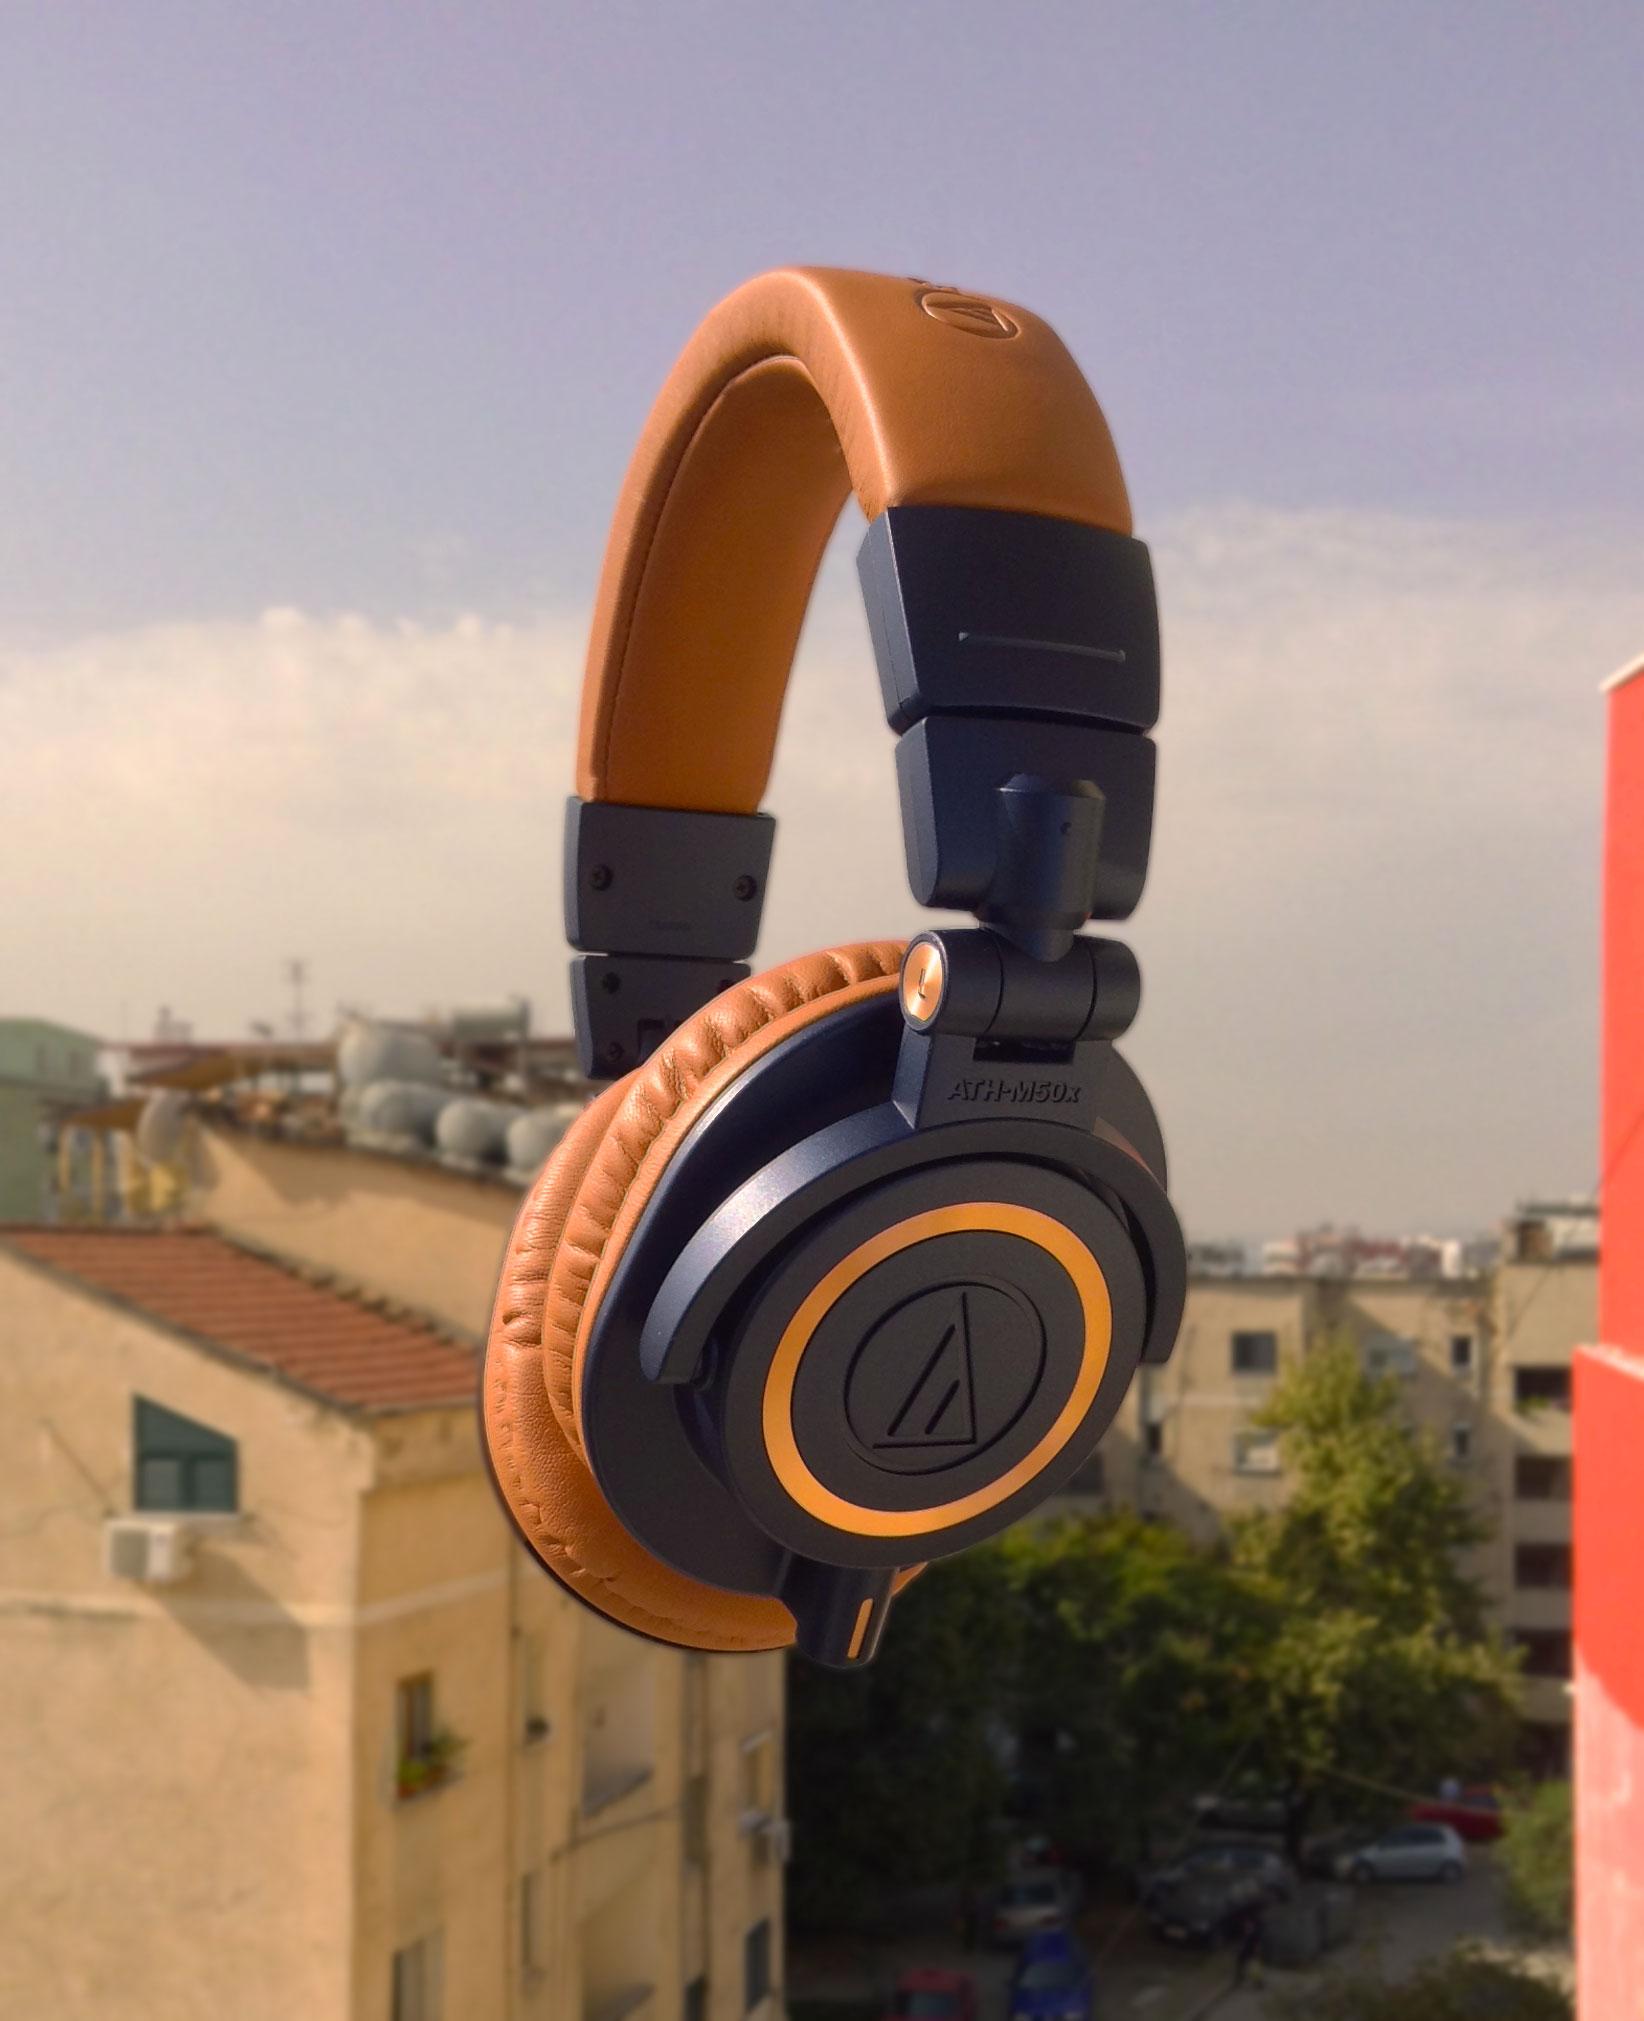 Audio-Technica M50x Review